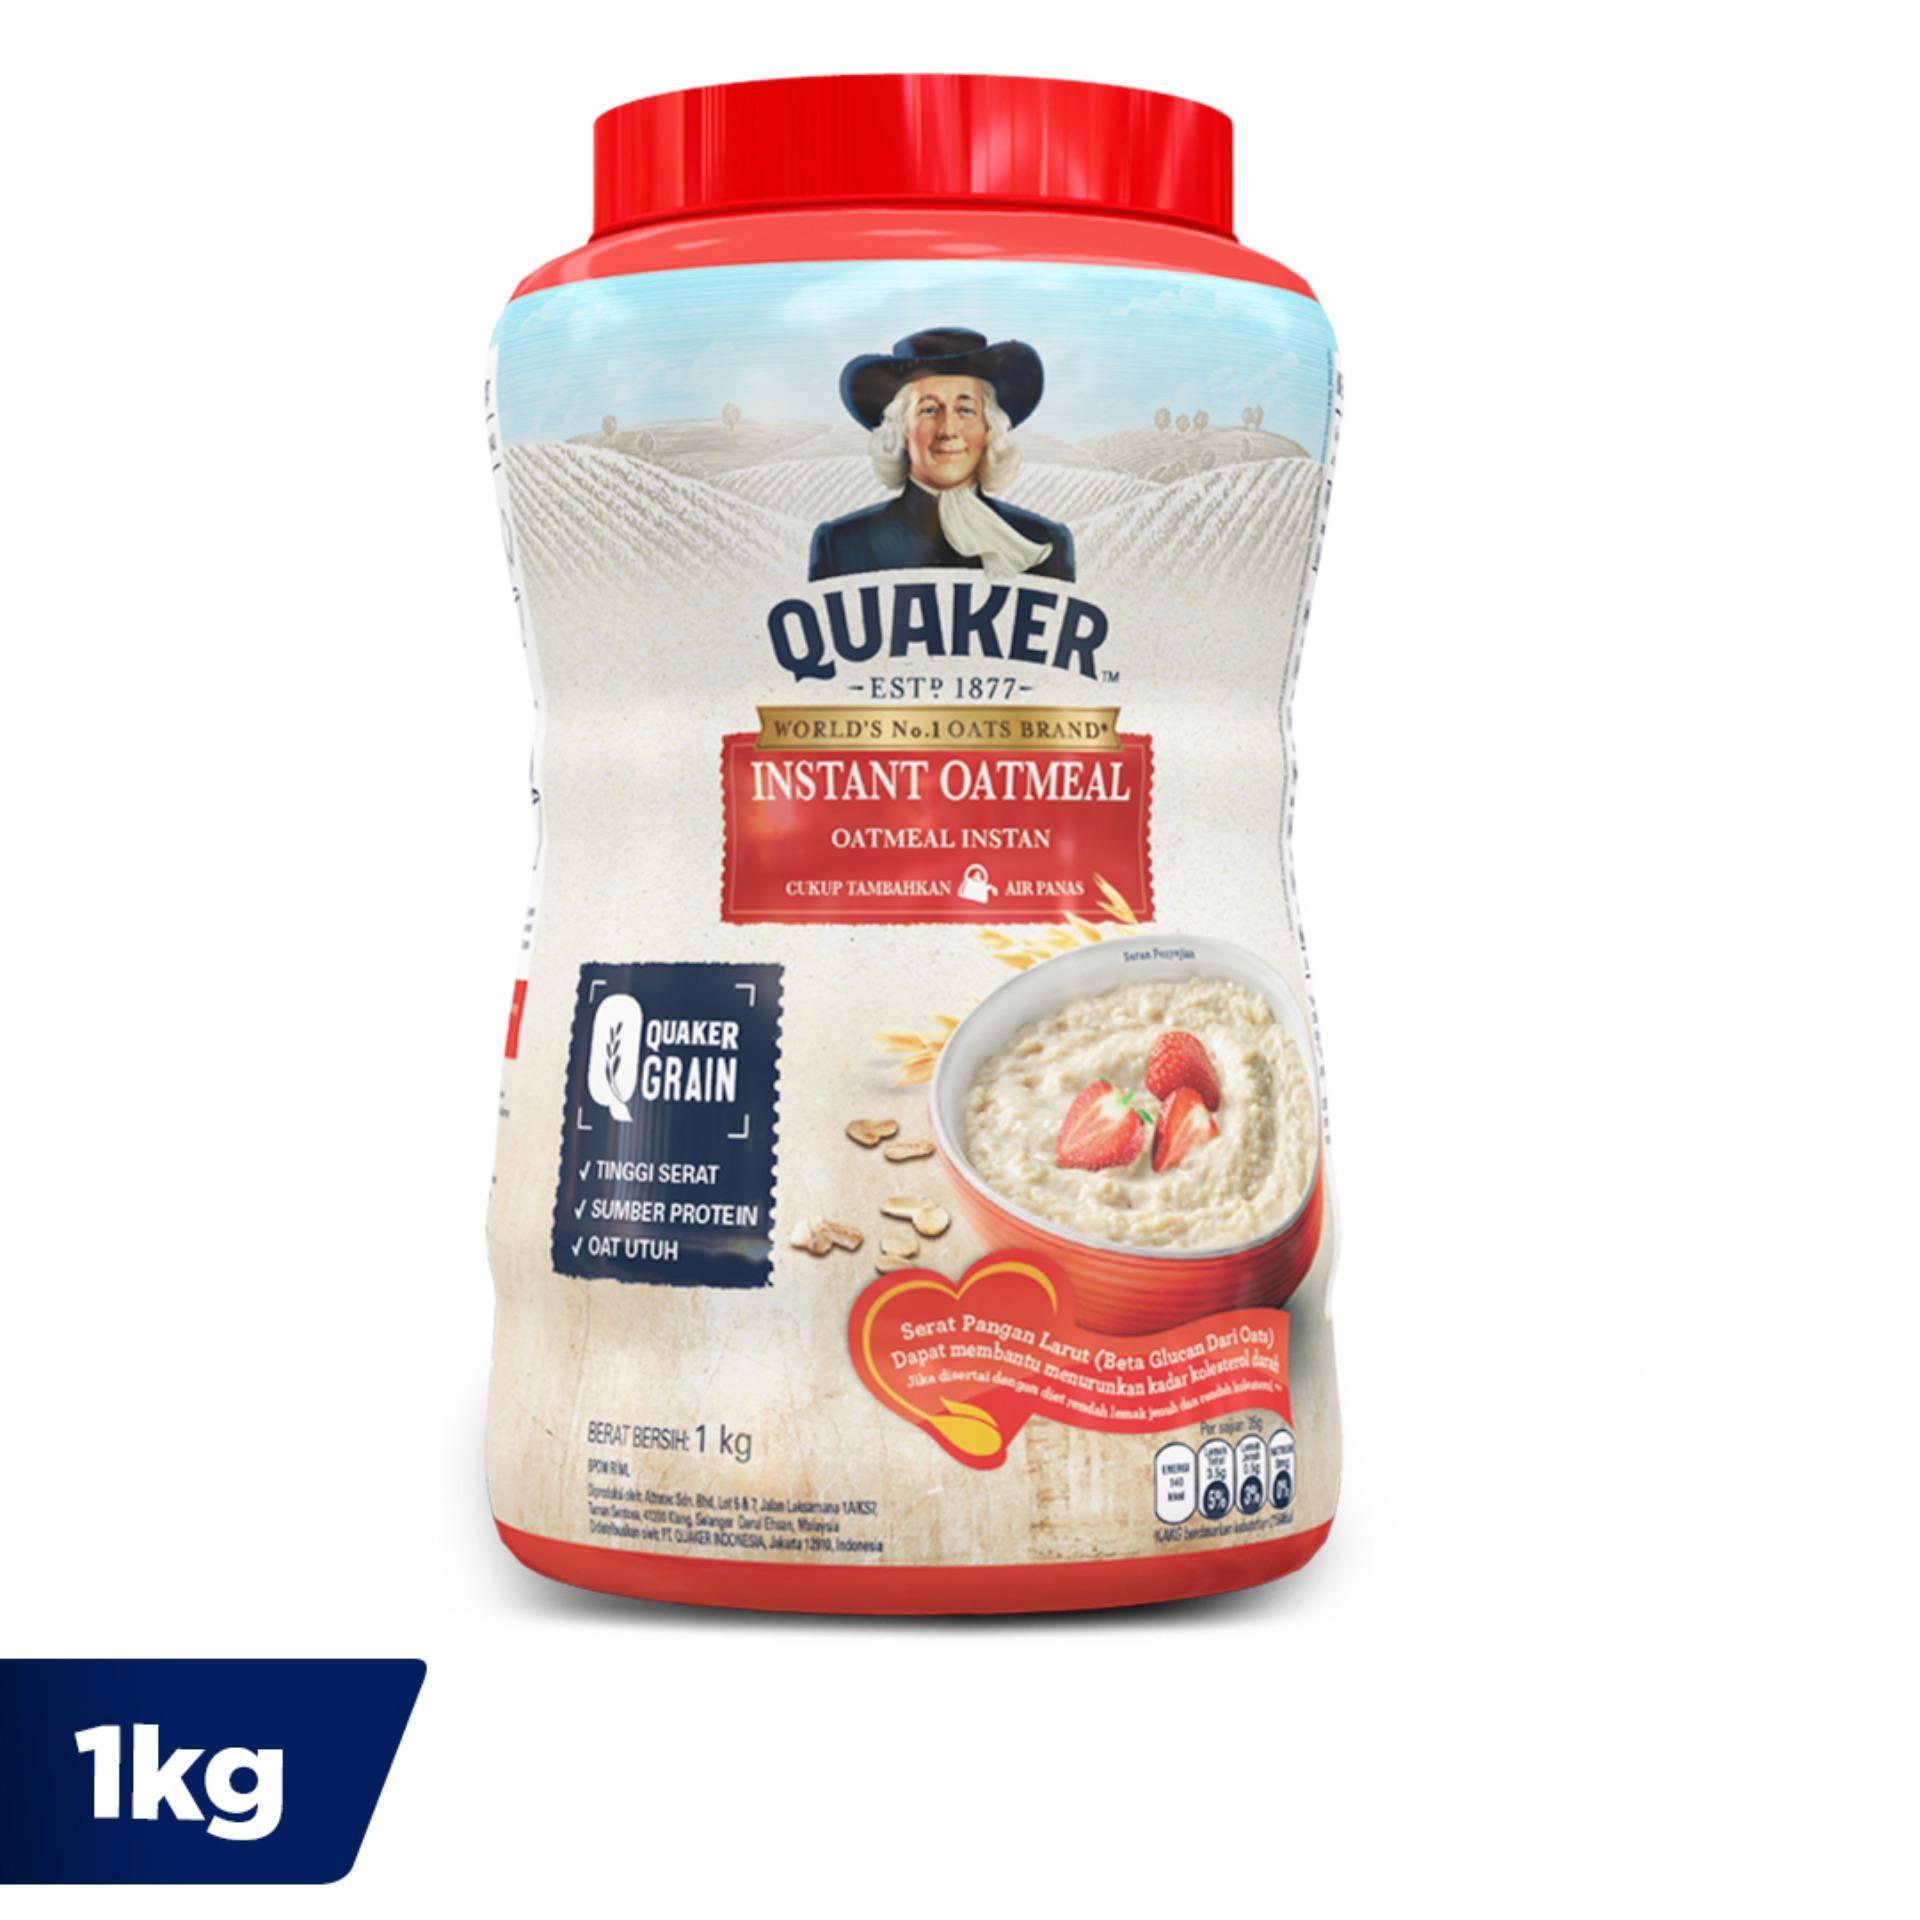 Quaker Instant Oatmeal 1 Kg